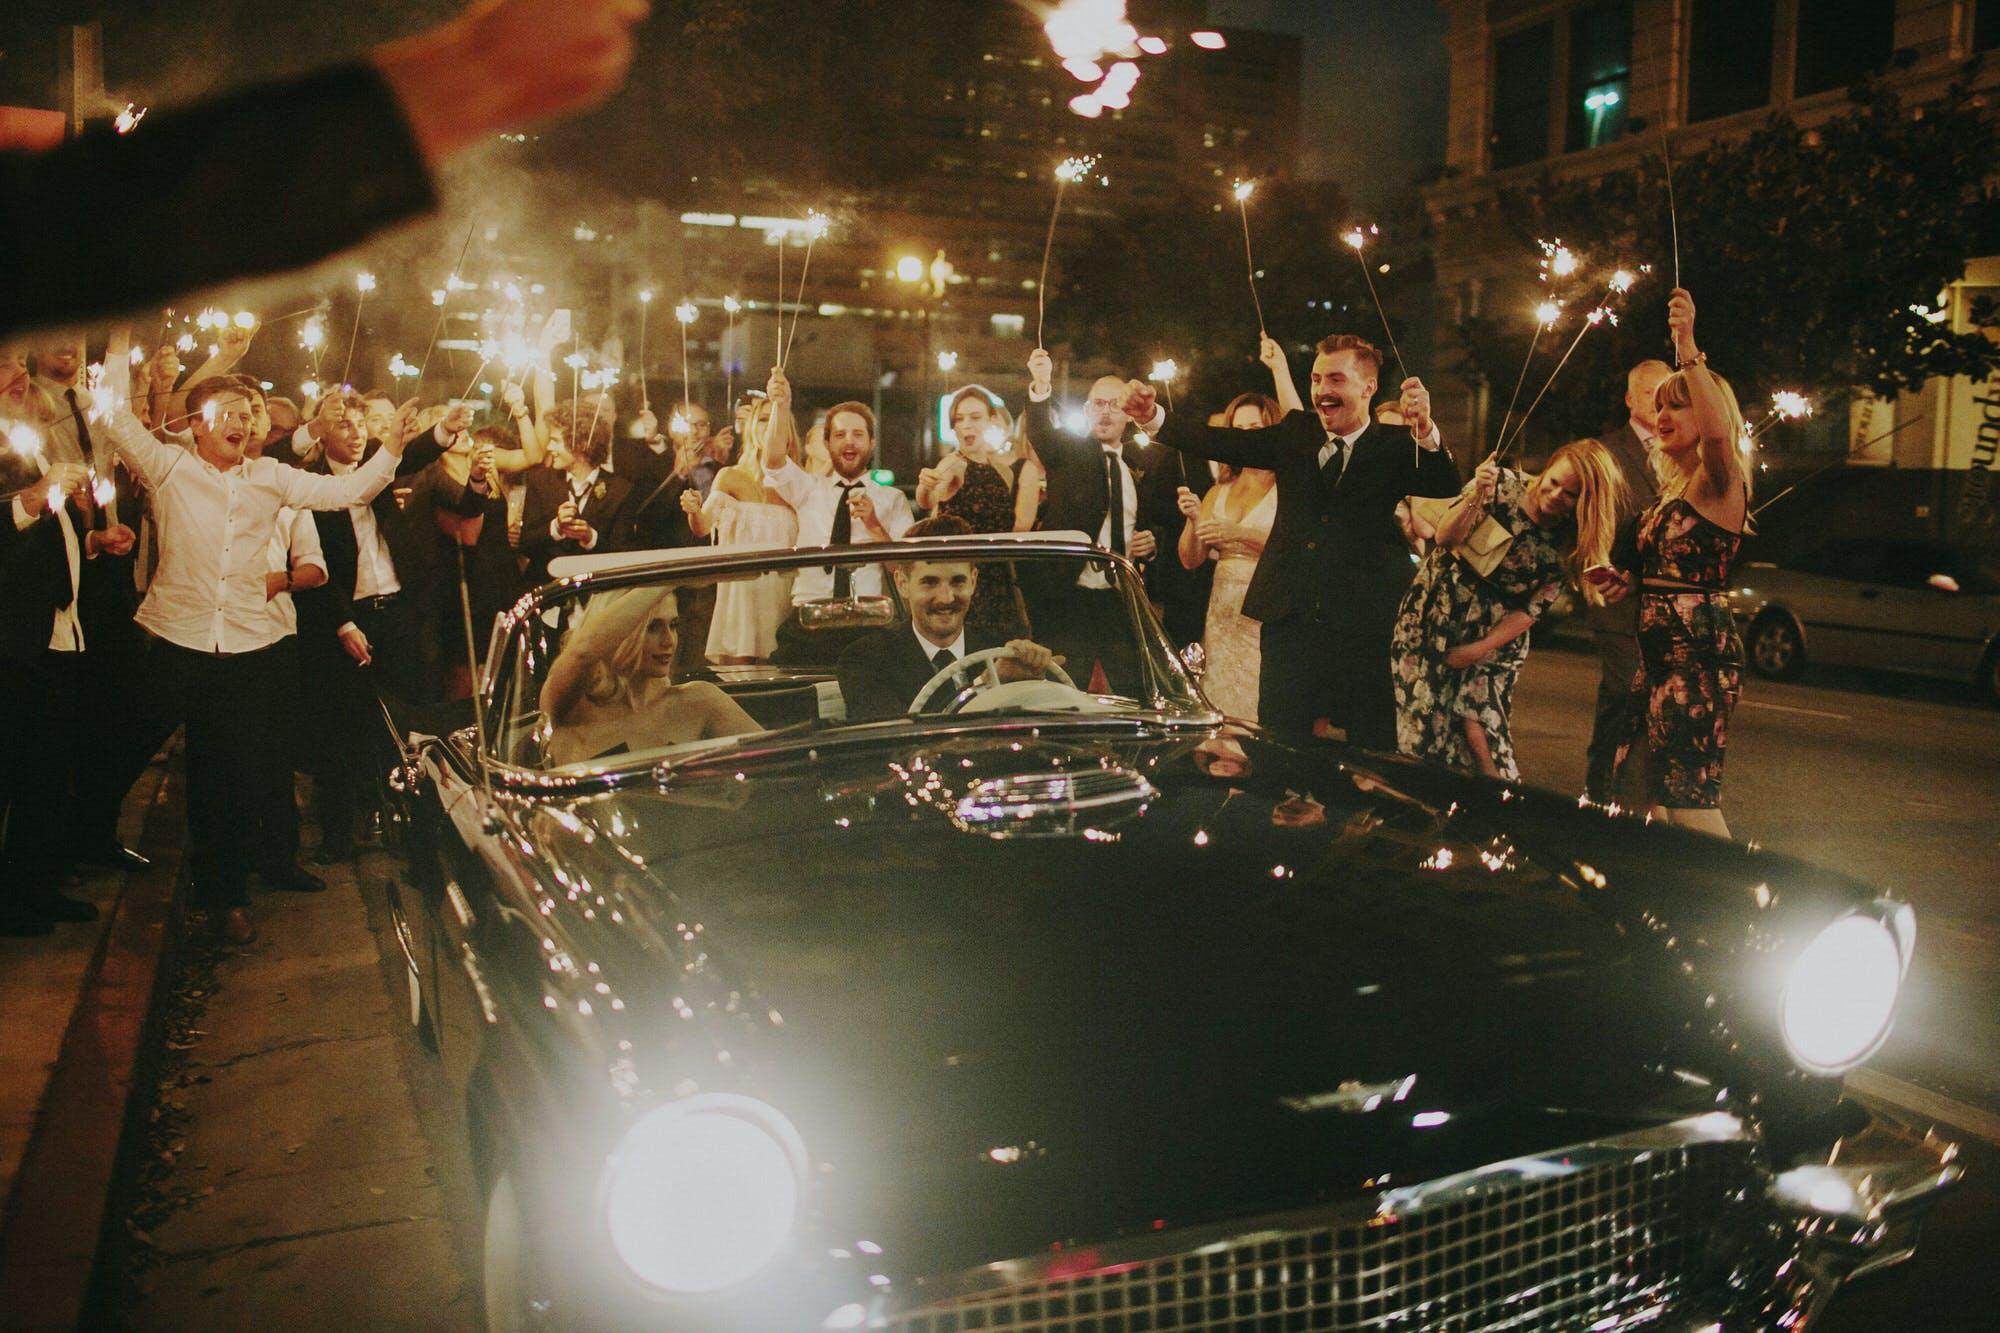 Los Angeles Wedding Photographer team Tyler Branch